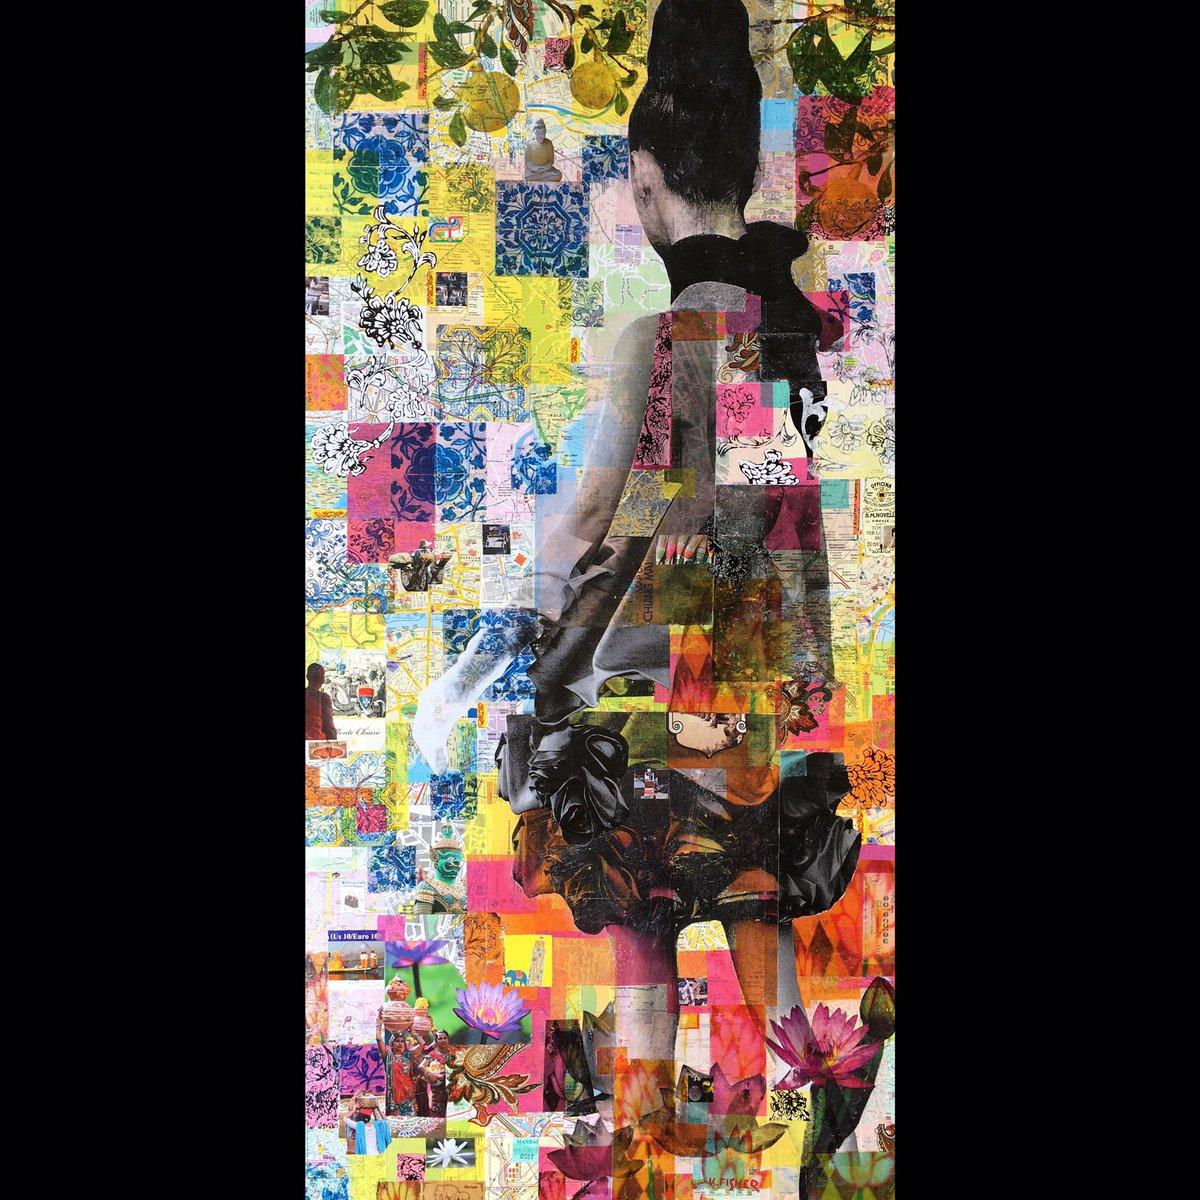 #commission #mixedmedia #art 48x24in #fashion inspired #kf4rt #Denverart #contemporaryart #newcontemporaryart #mixedmediaart &quot;Amy&#39;sAlbatross<br>http://pic.twitter.com/Y04Tl9lMGP